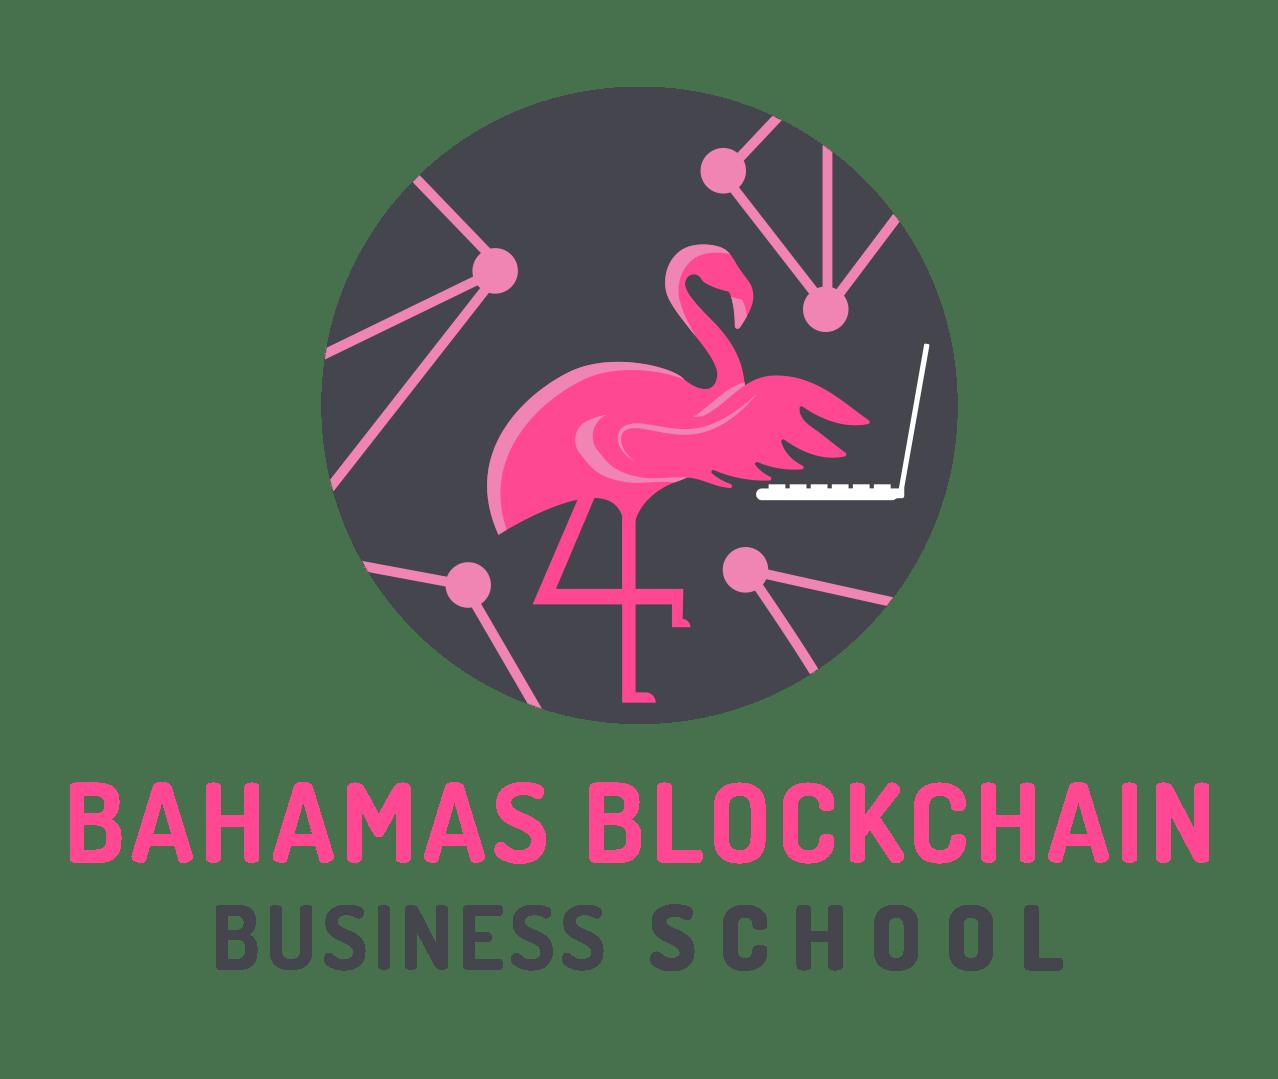 Bahamas Blockchain Business School